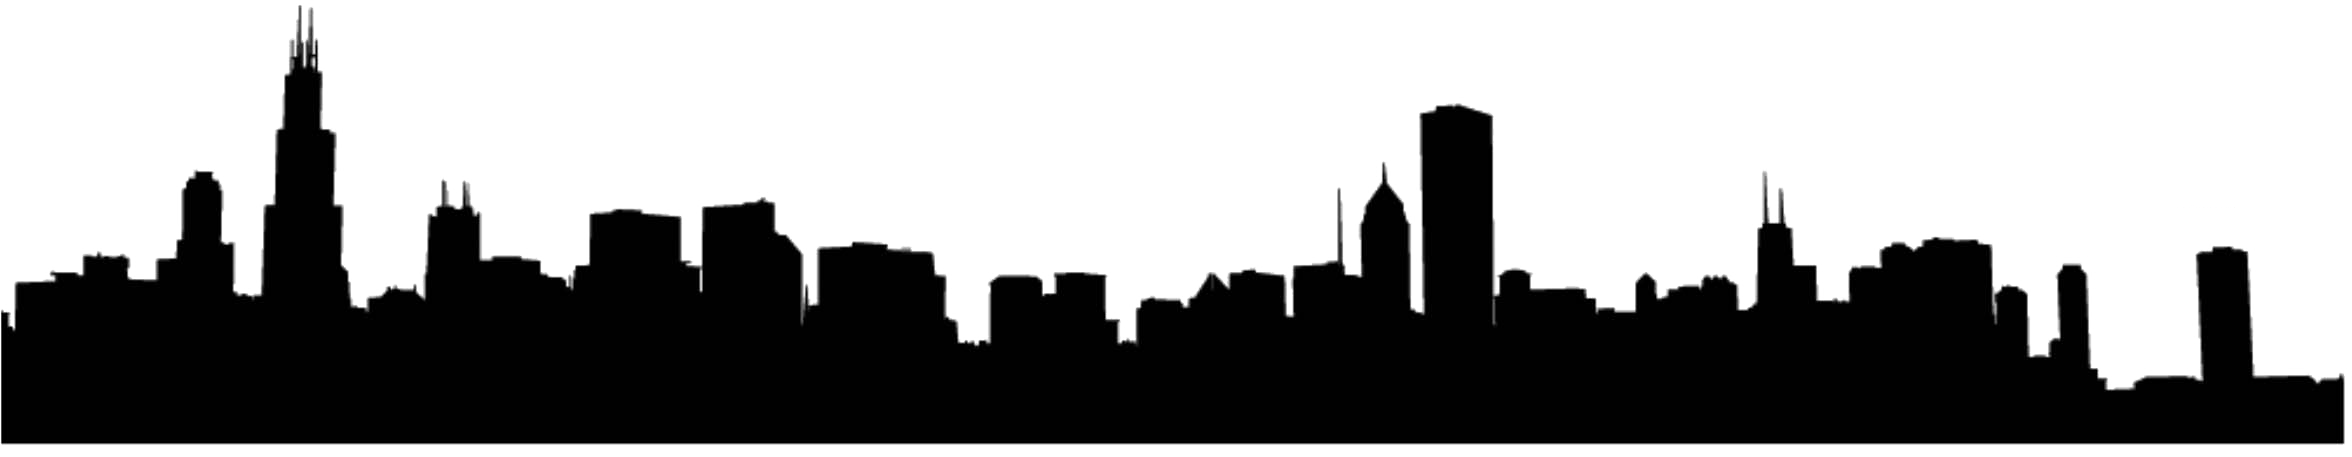 2352x457 The Zen Of Skyline Silhouettes Phi Mu Alpha Sinfonia